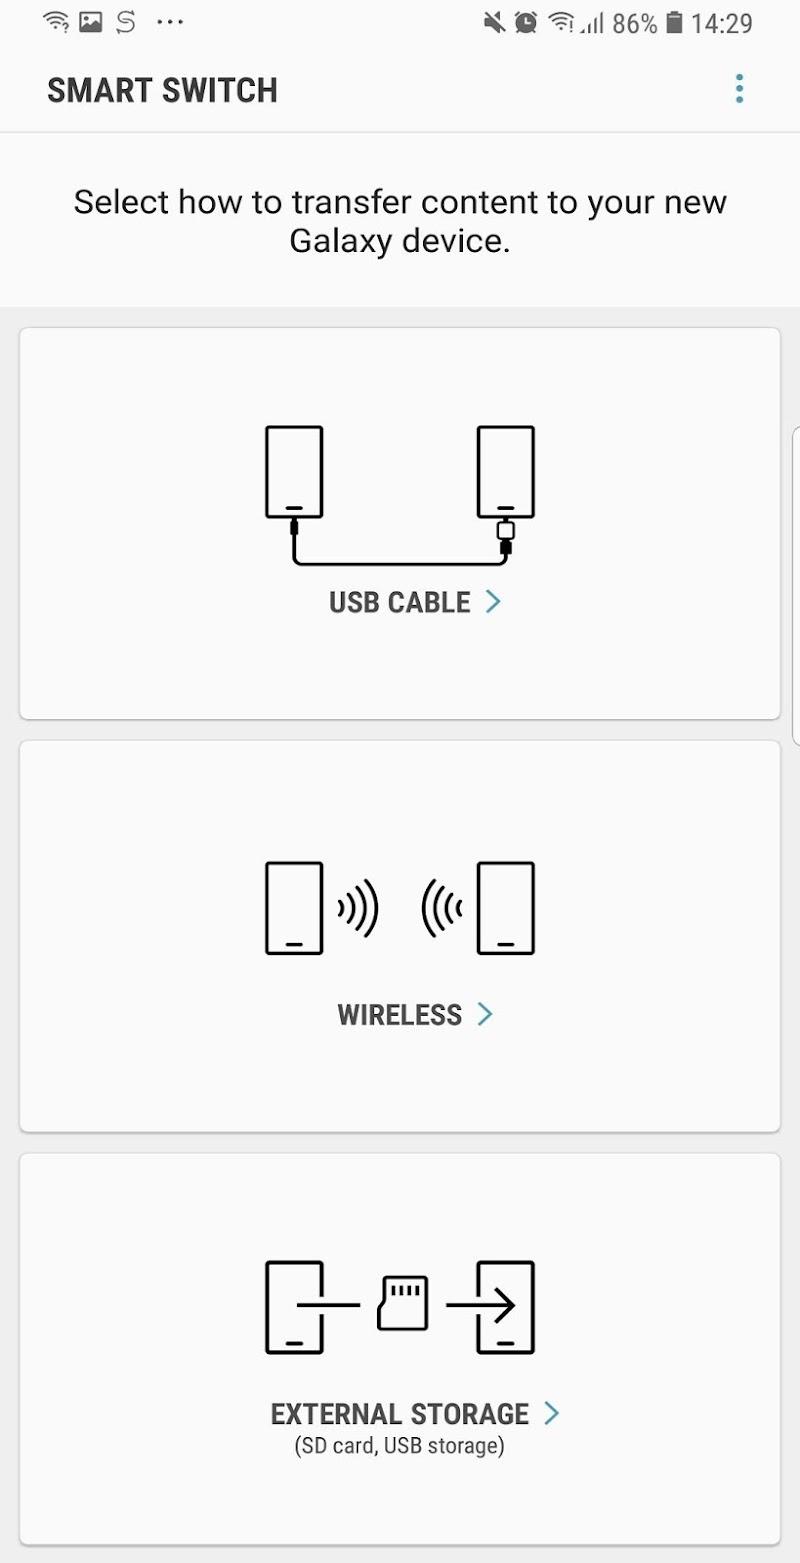 samsung smart switch apk 3.5.03.7